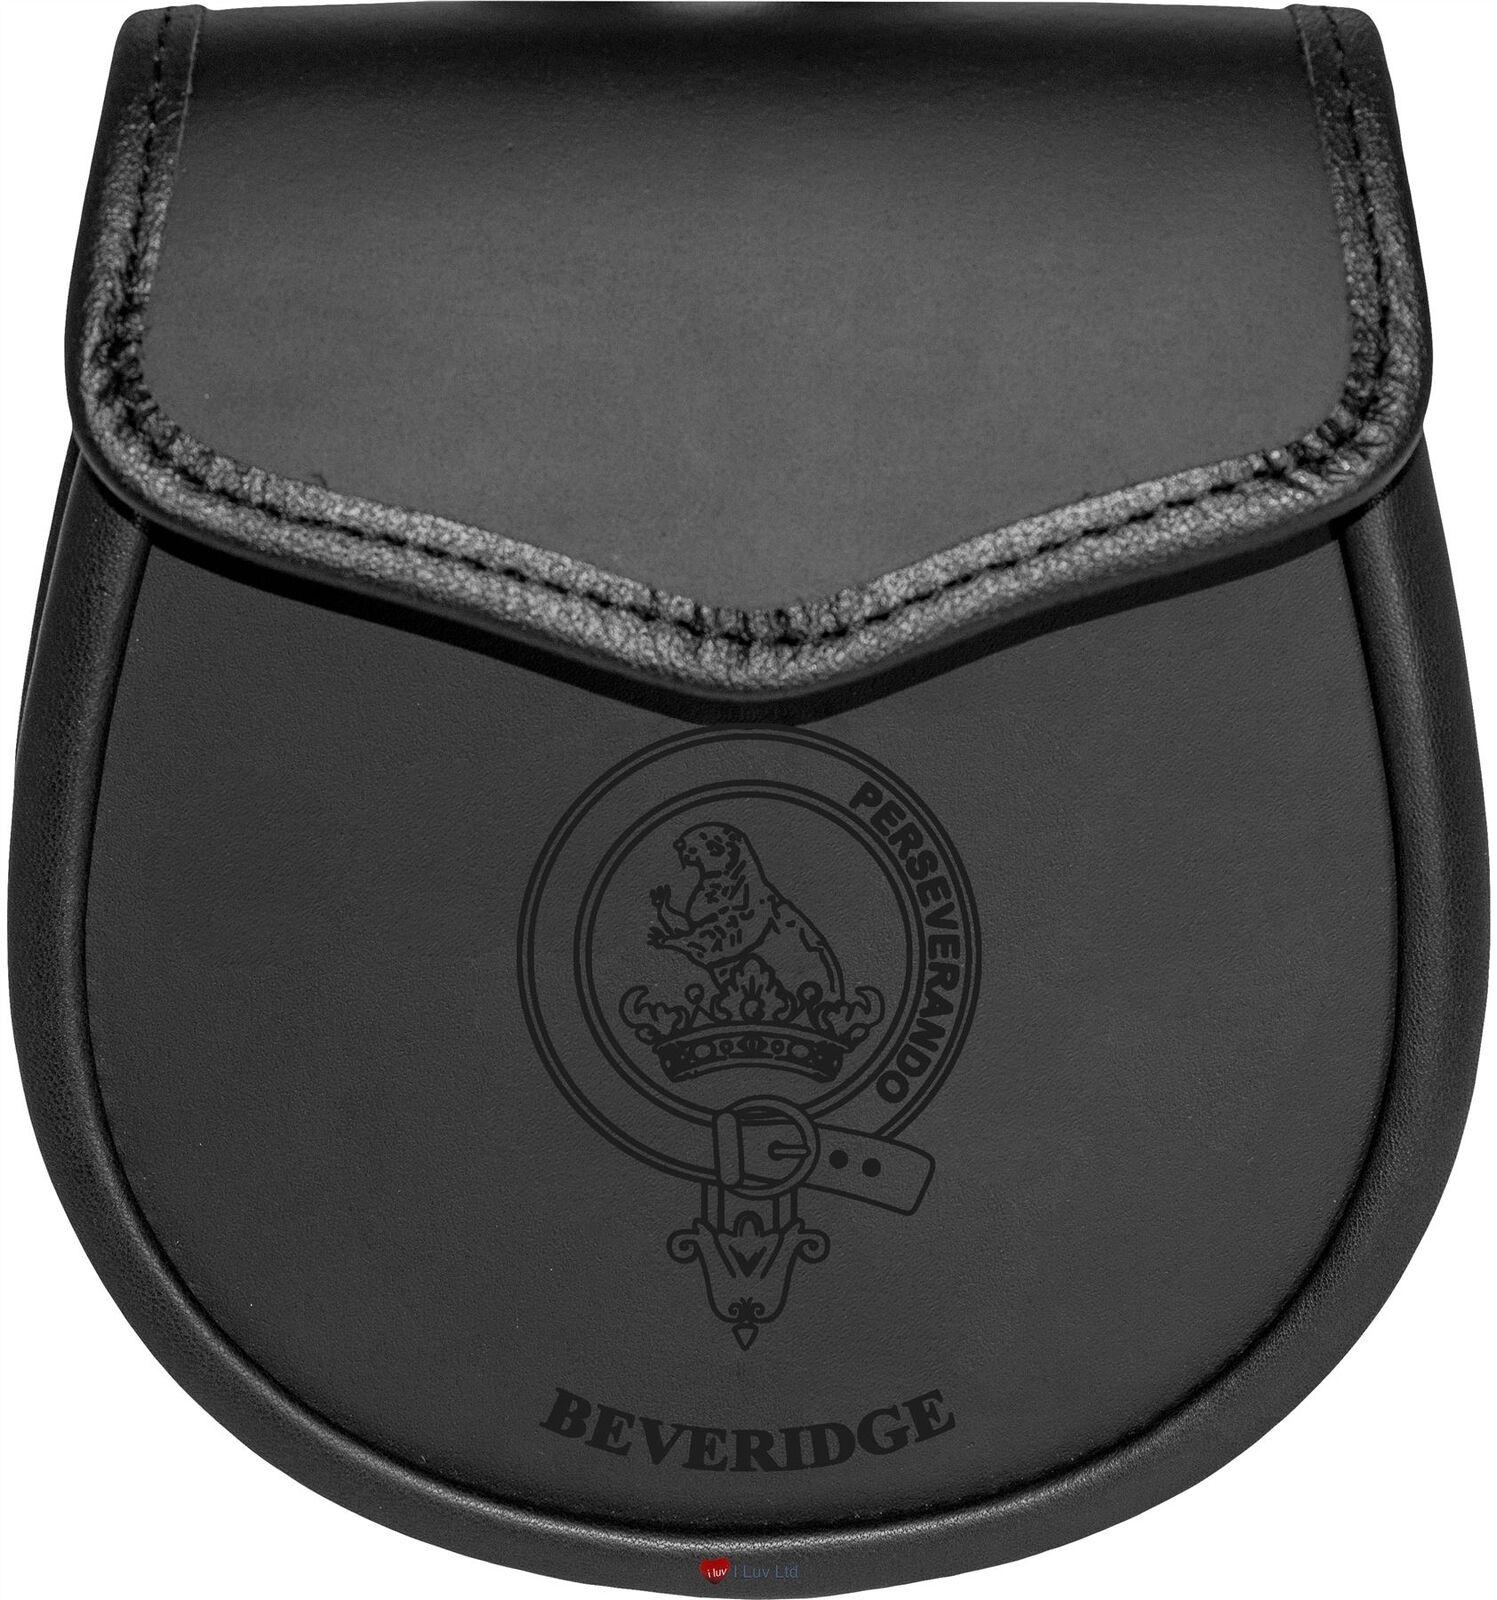 Beveridge Leather Day Sporran Scottish Clan Crest